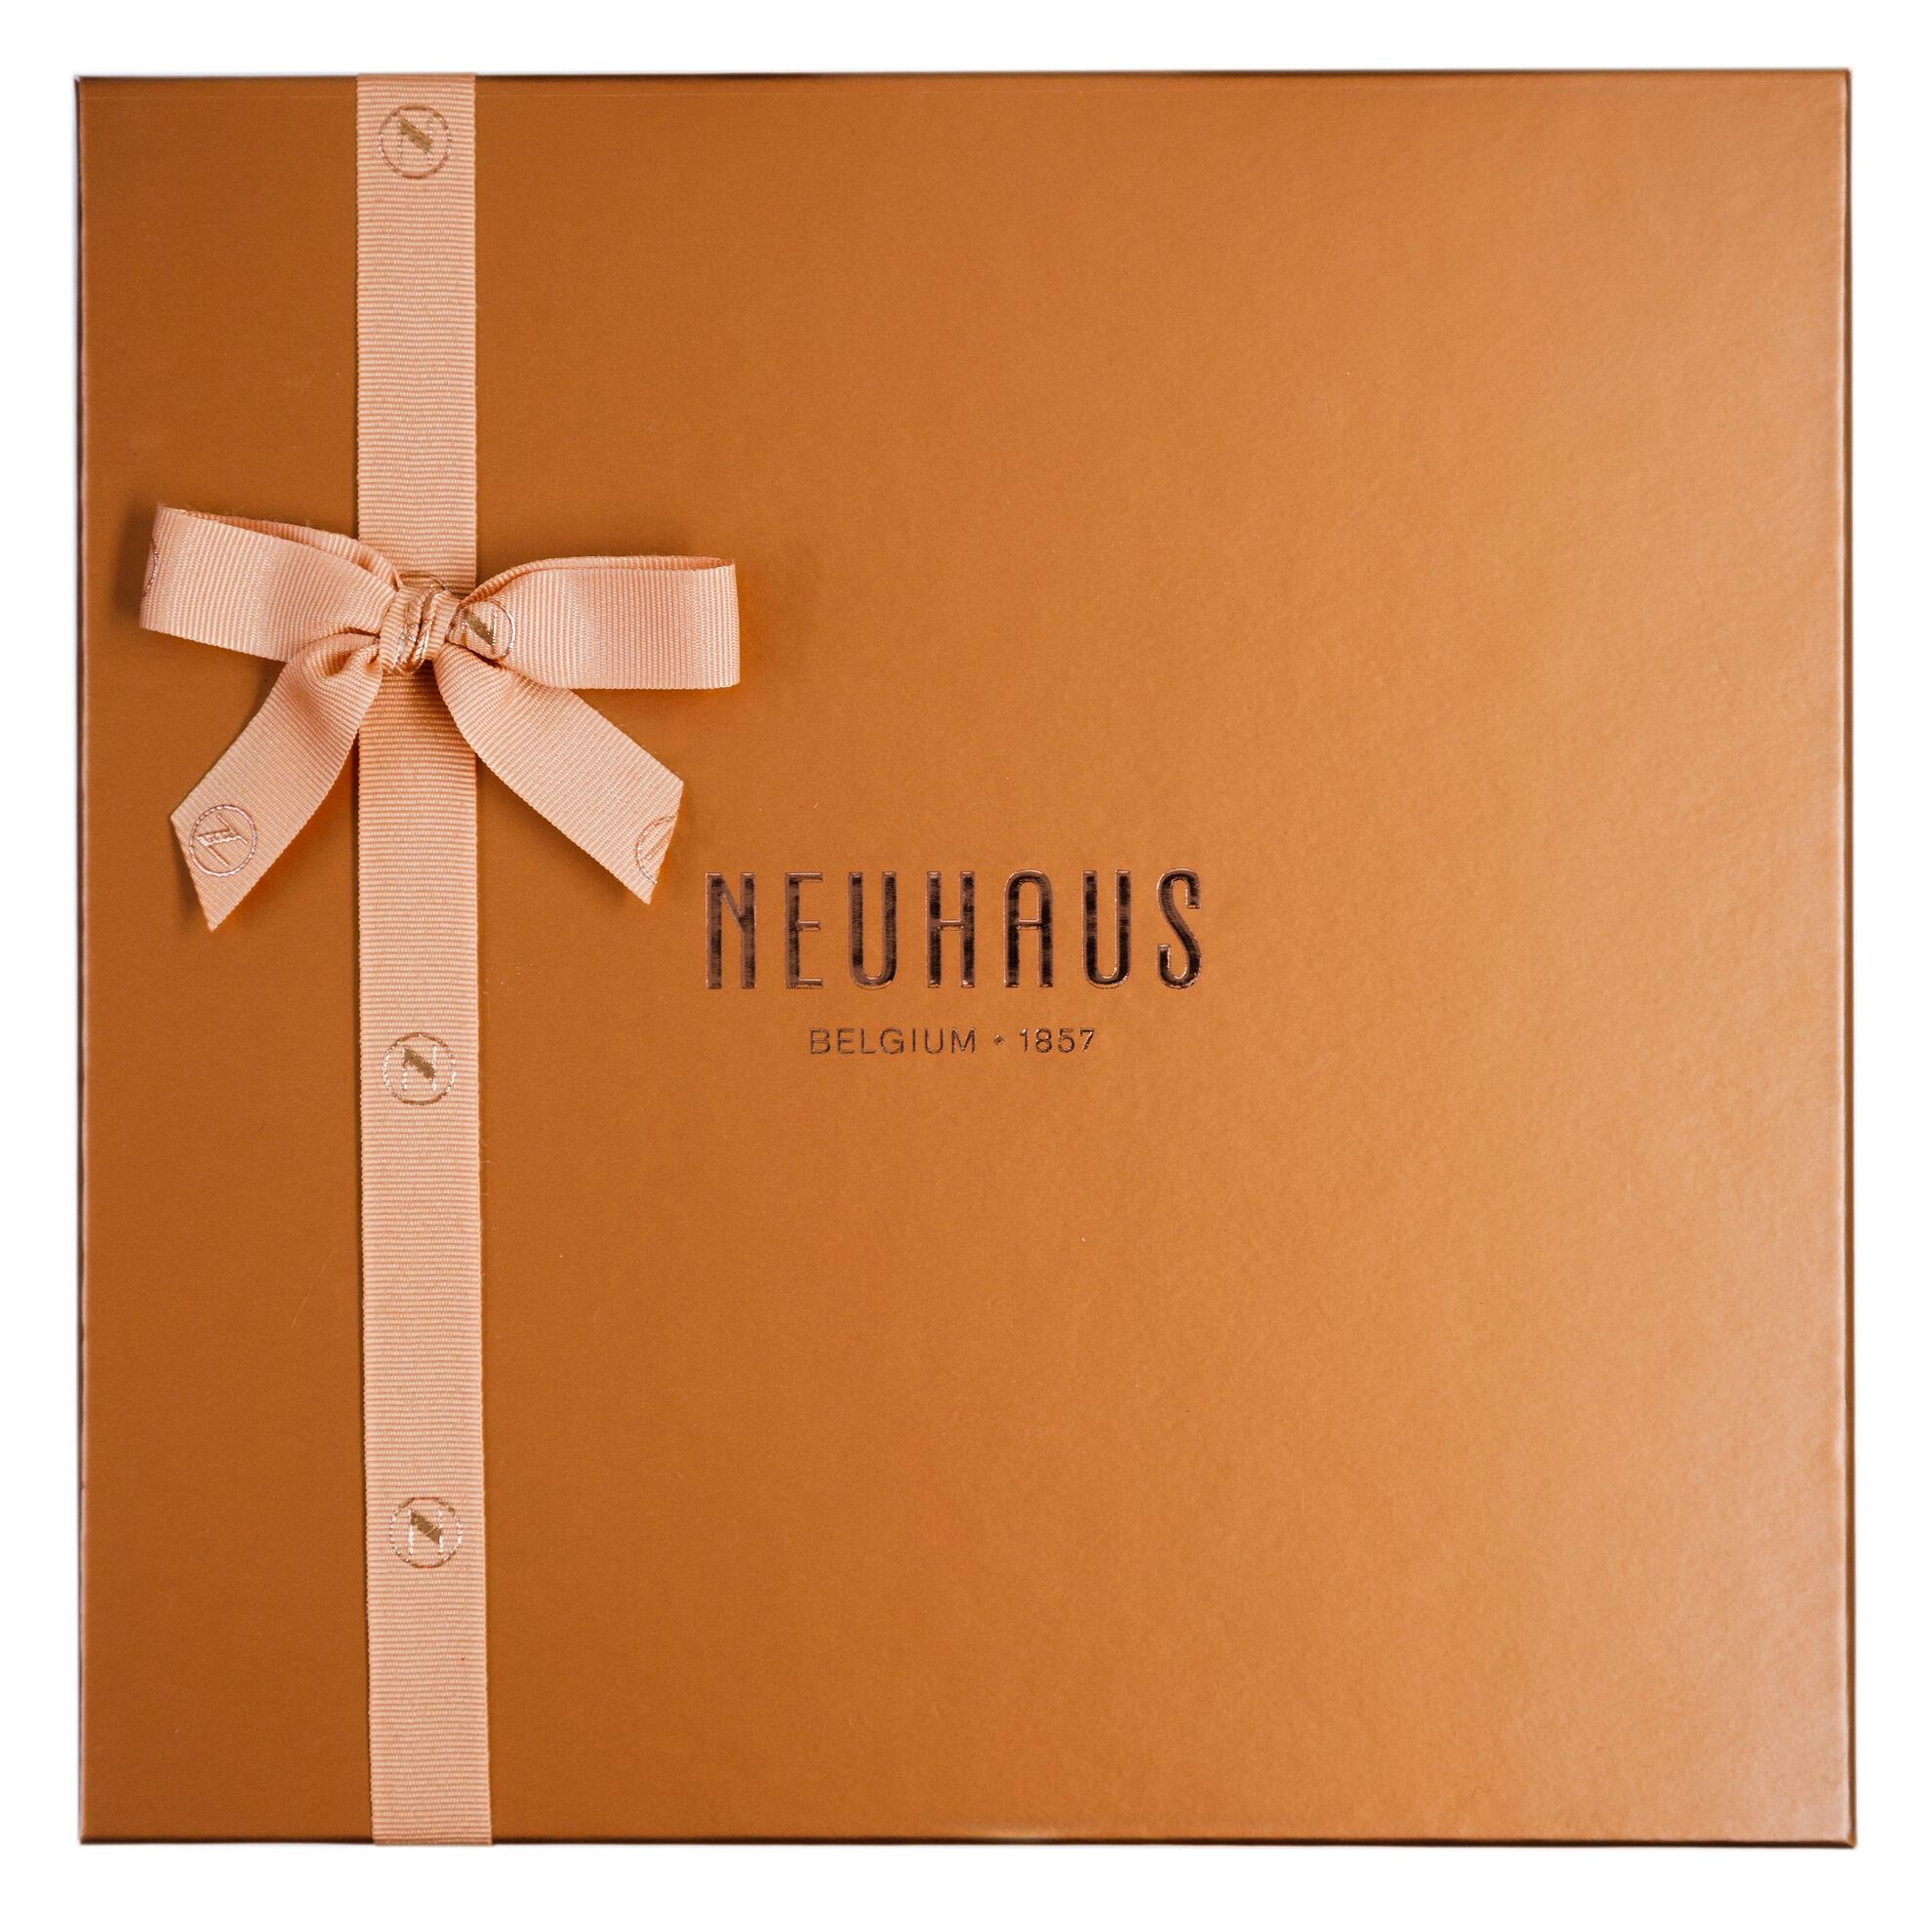 Luxury Belgian Chocolate Gift Box by Neuhaus 42 pcs image number 11